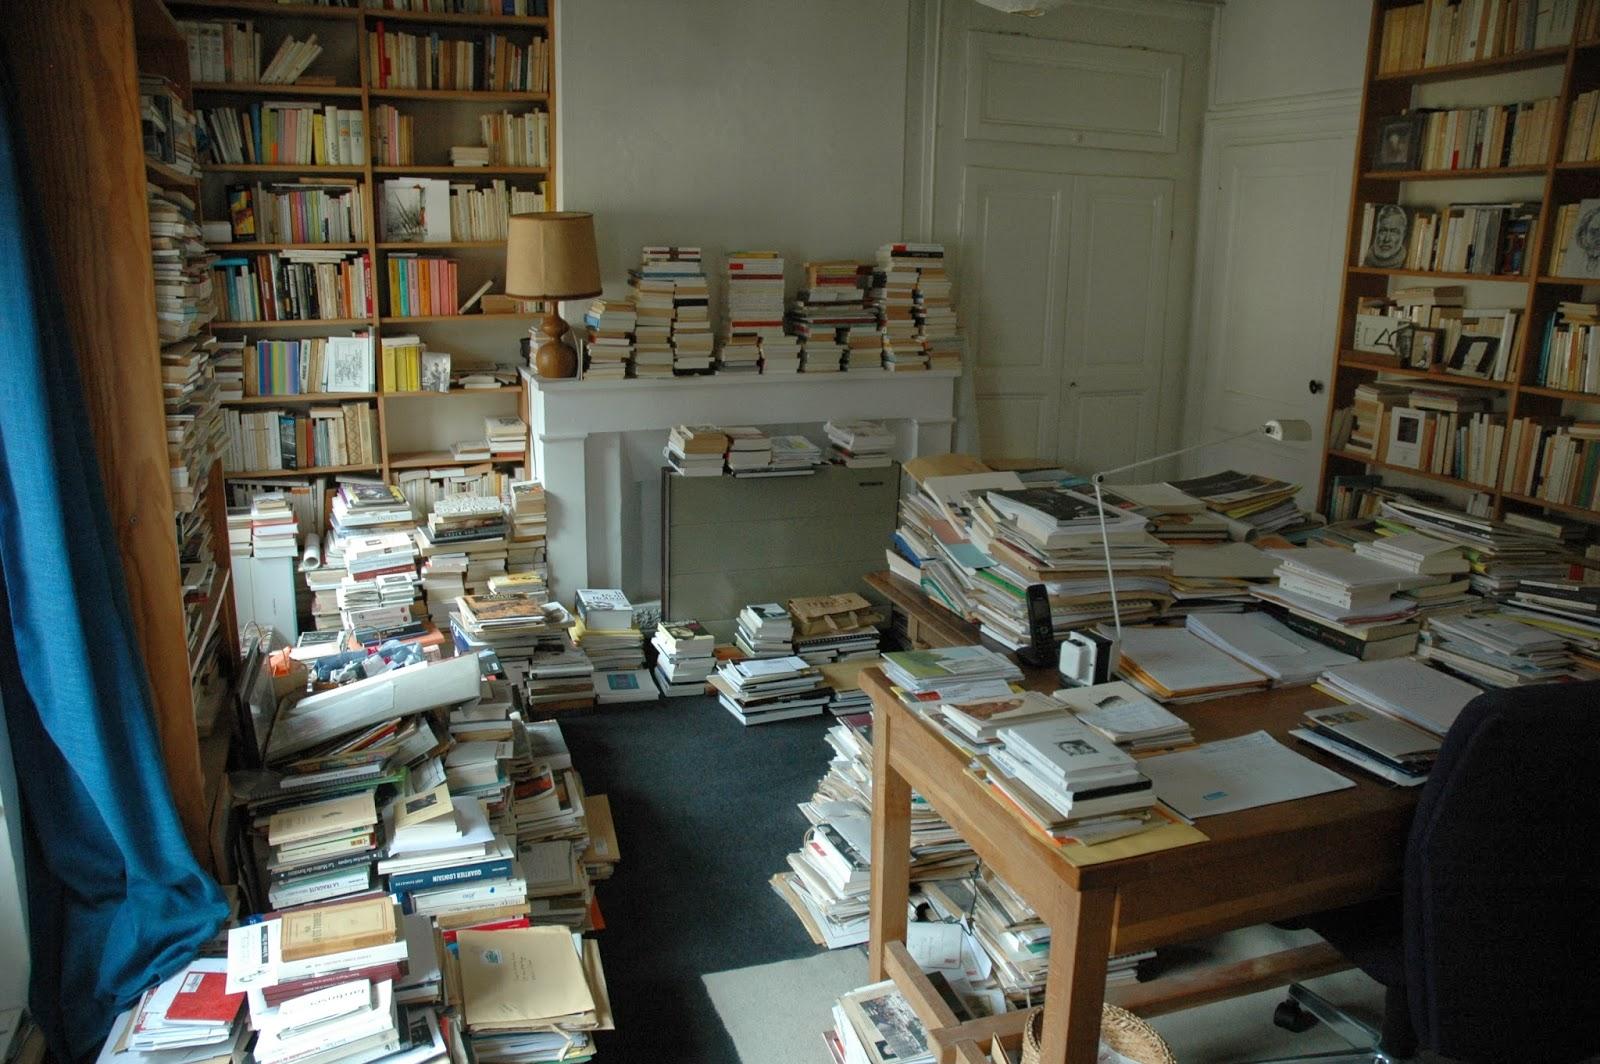 Une bibliothèque de bibliothèques